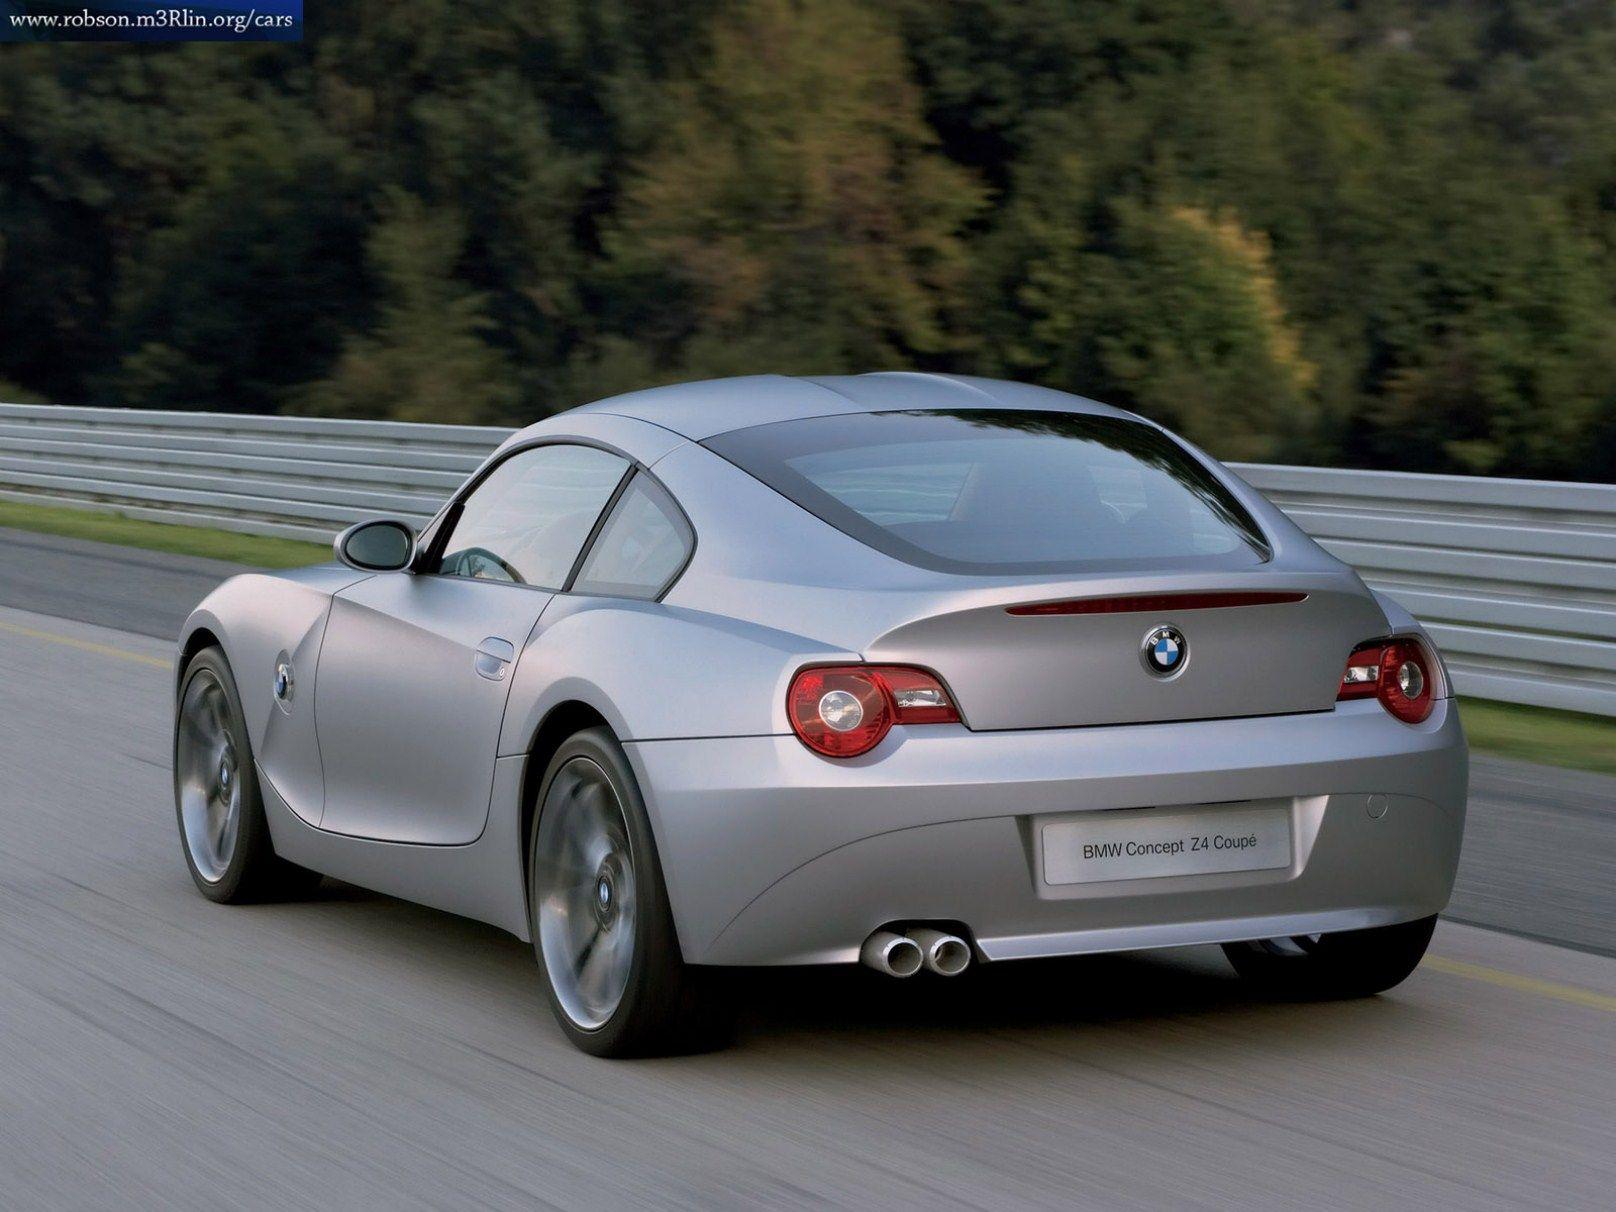 2005 bmw colors | 2005 BMW Z4 Roadster 2.5i | BMW Colors | Car ...